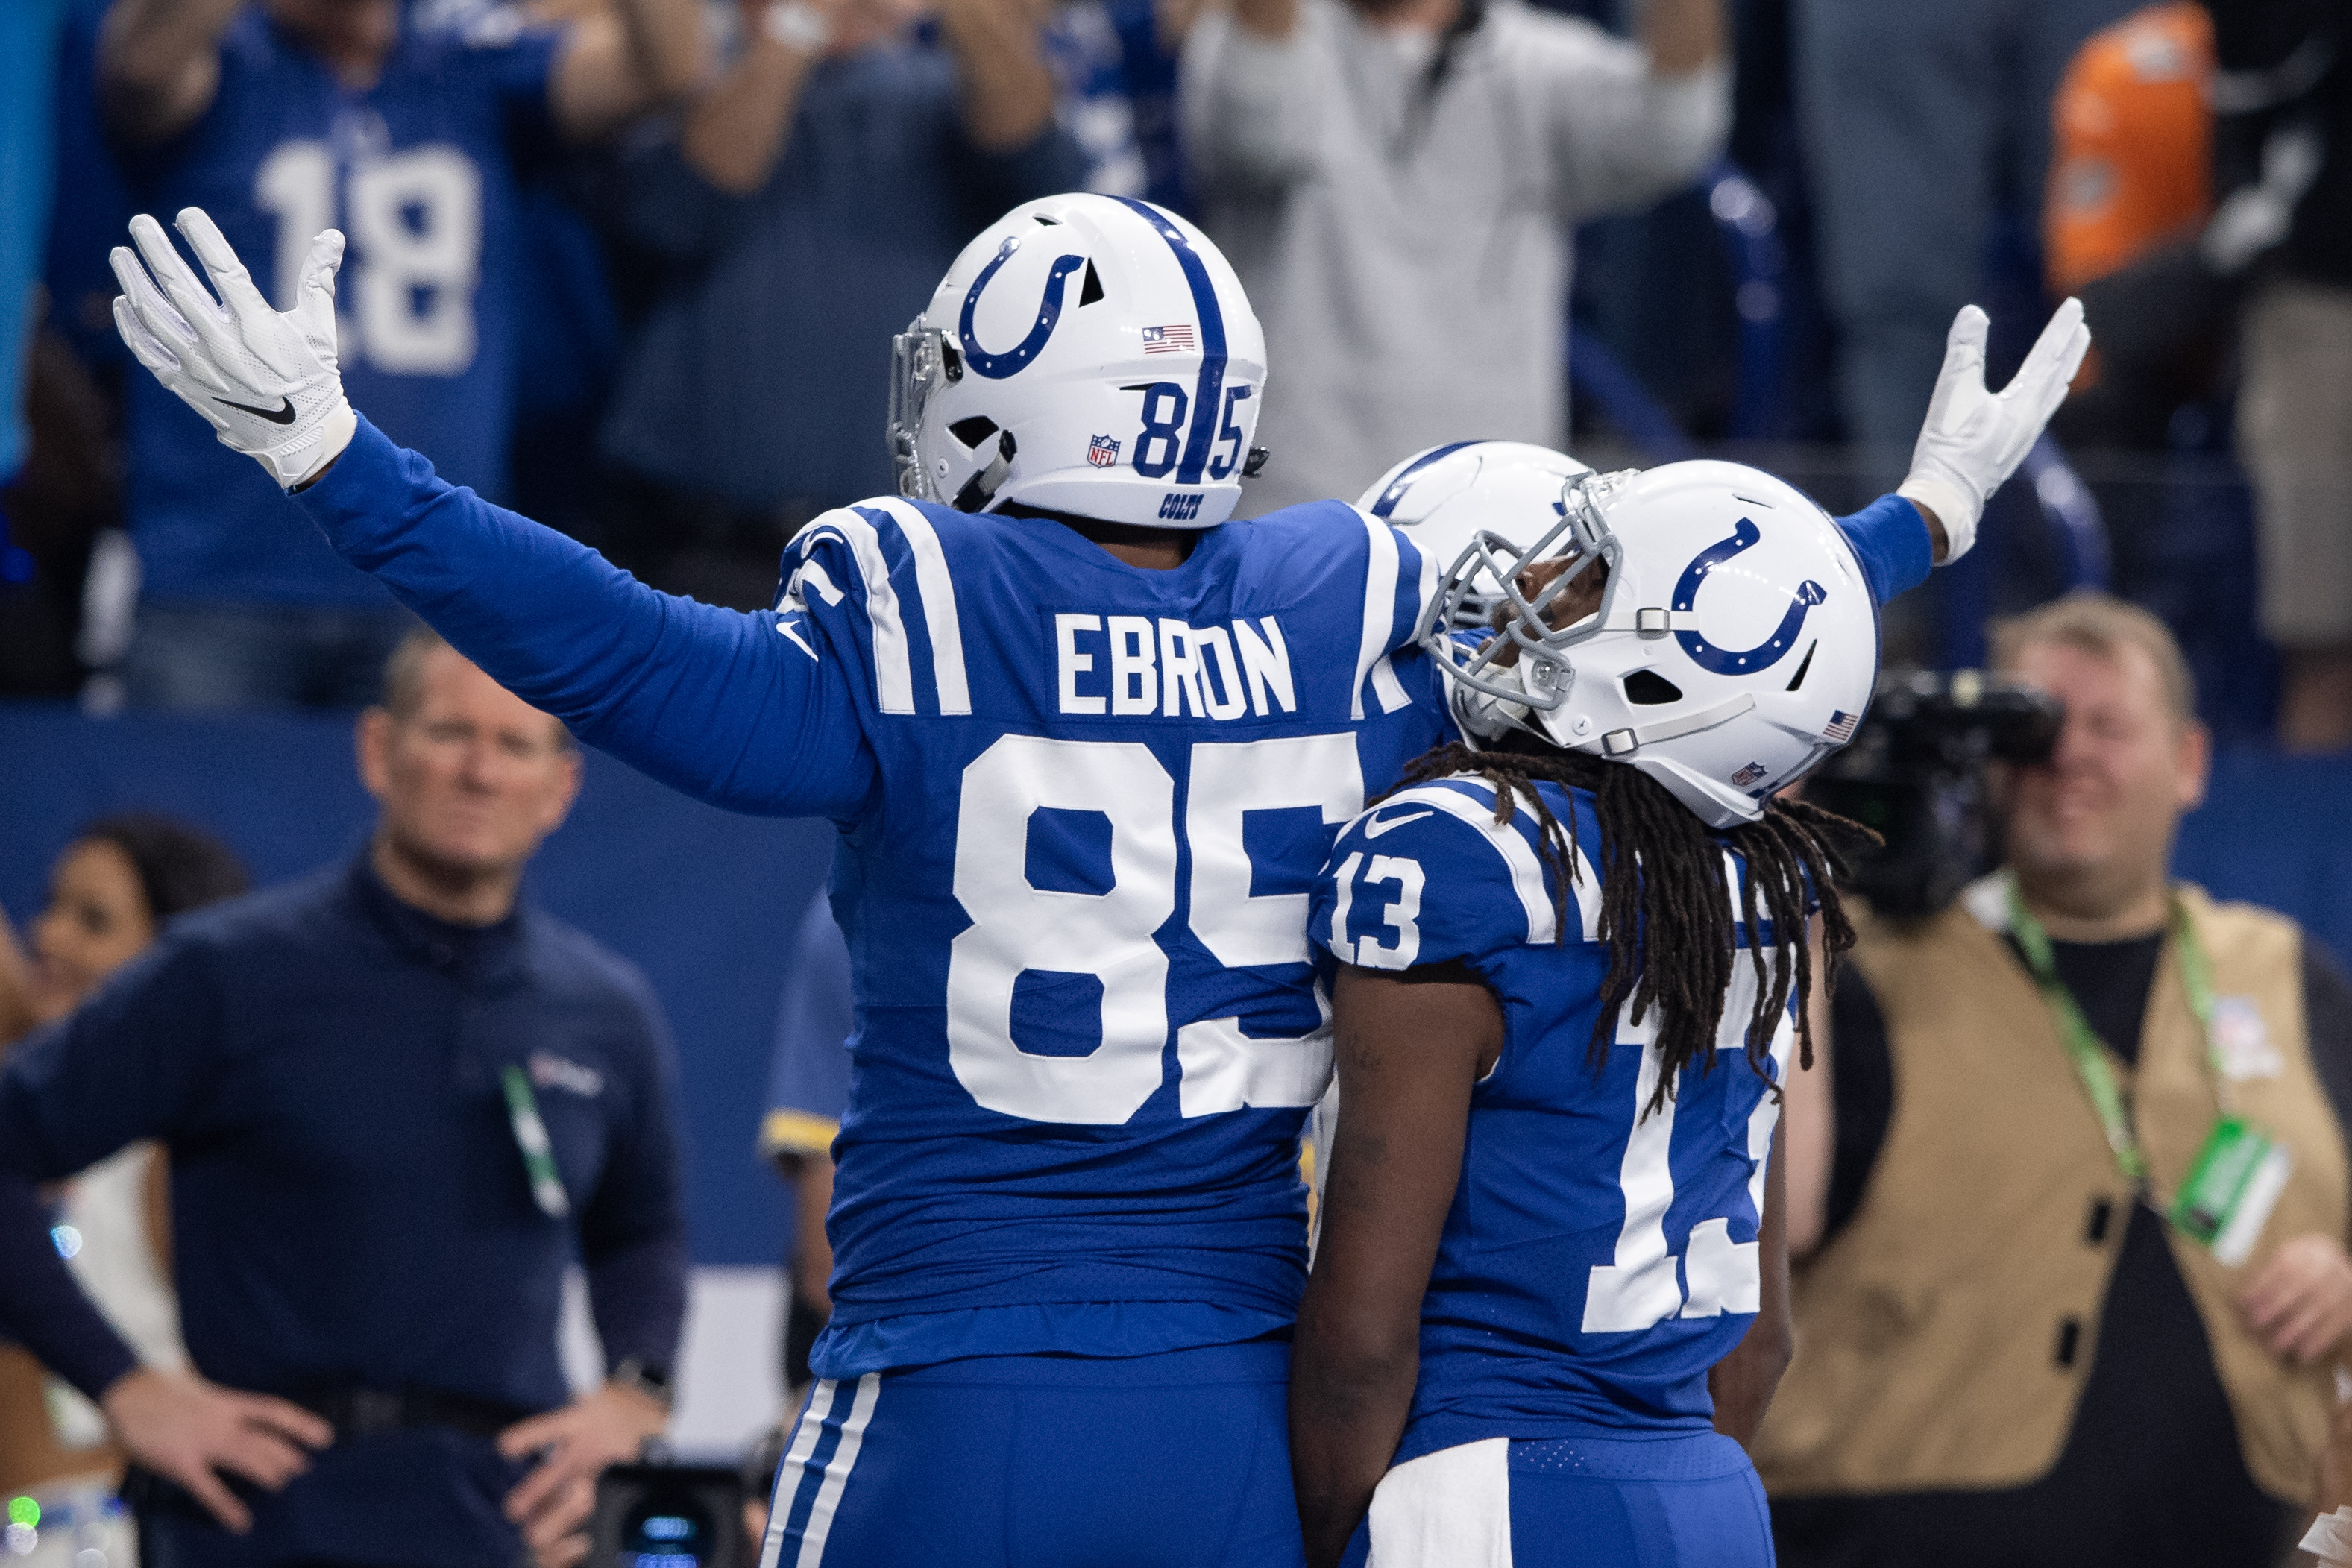 NFL: NOV 25 Dolphins at Colts